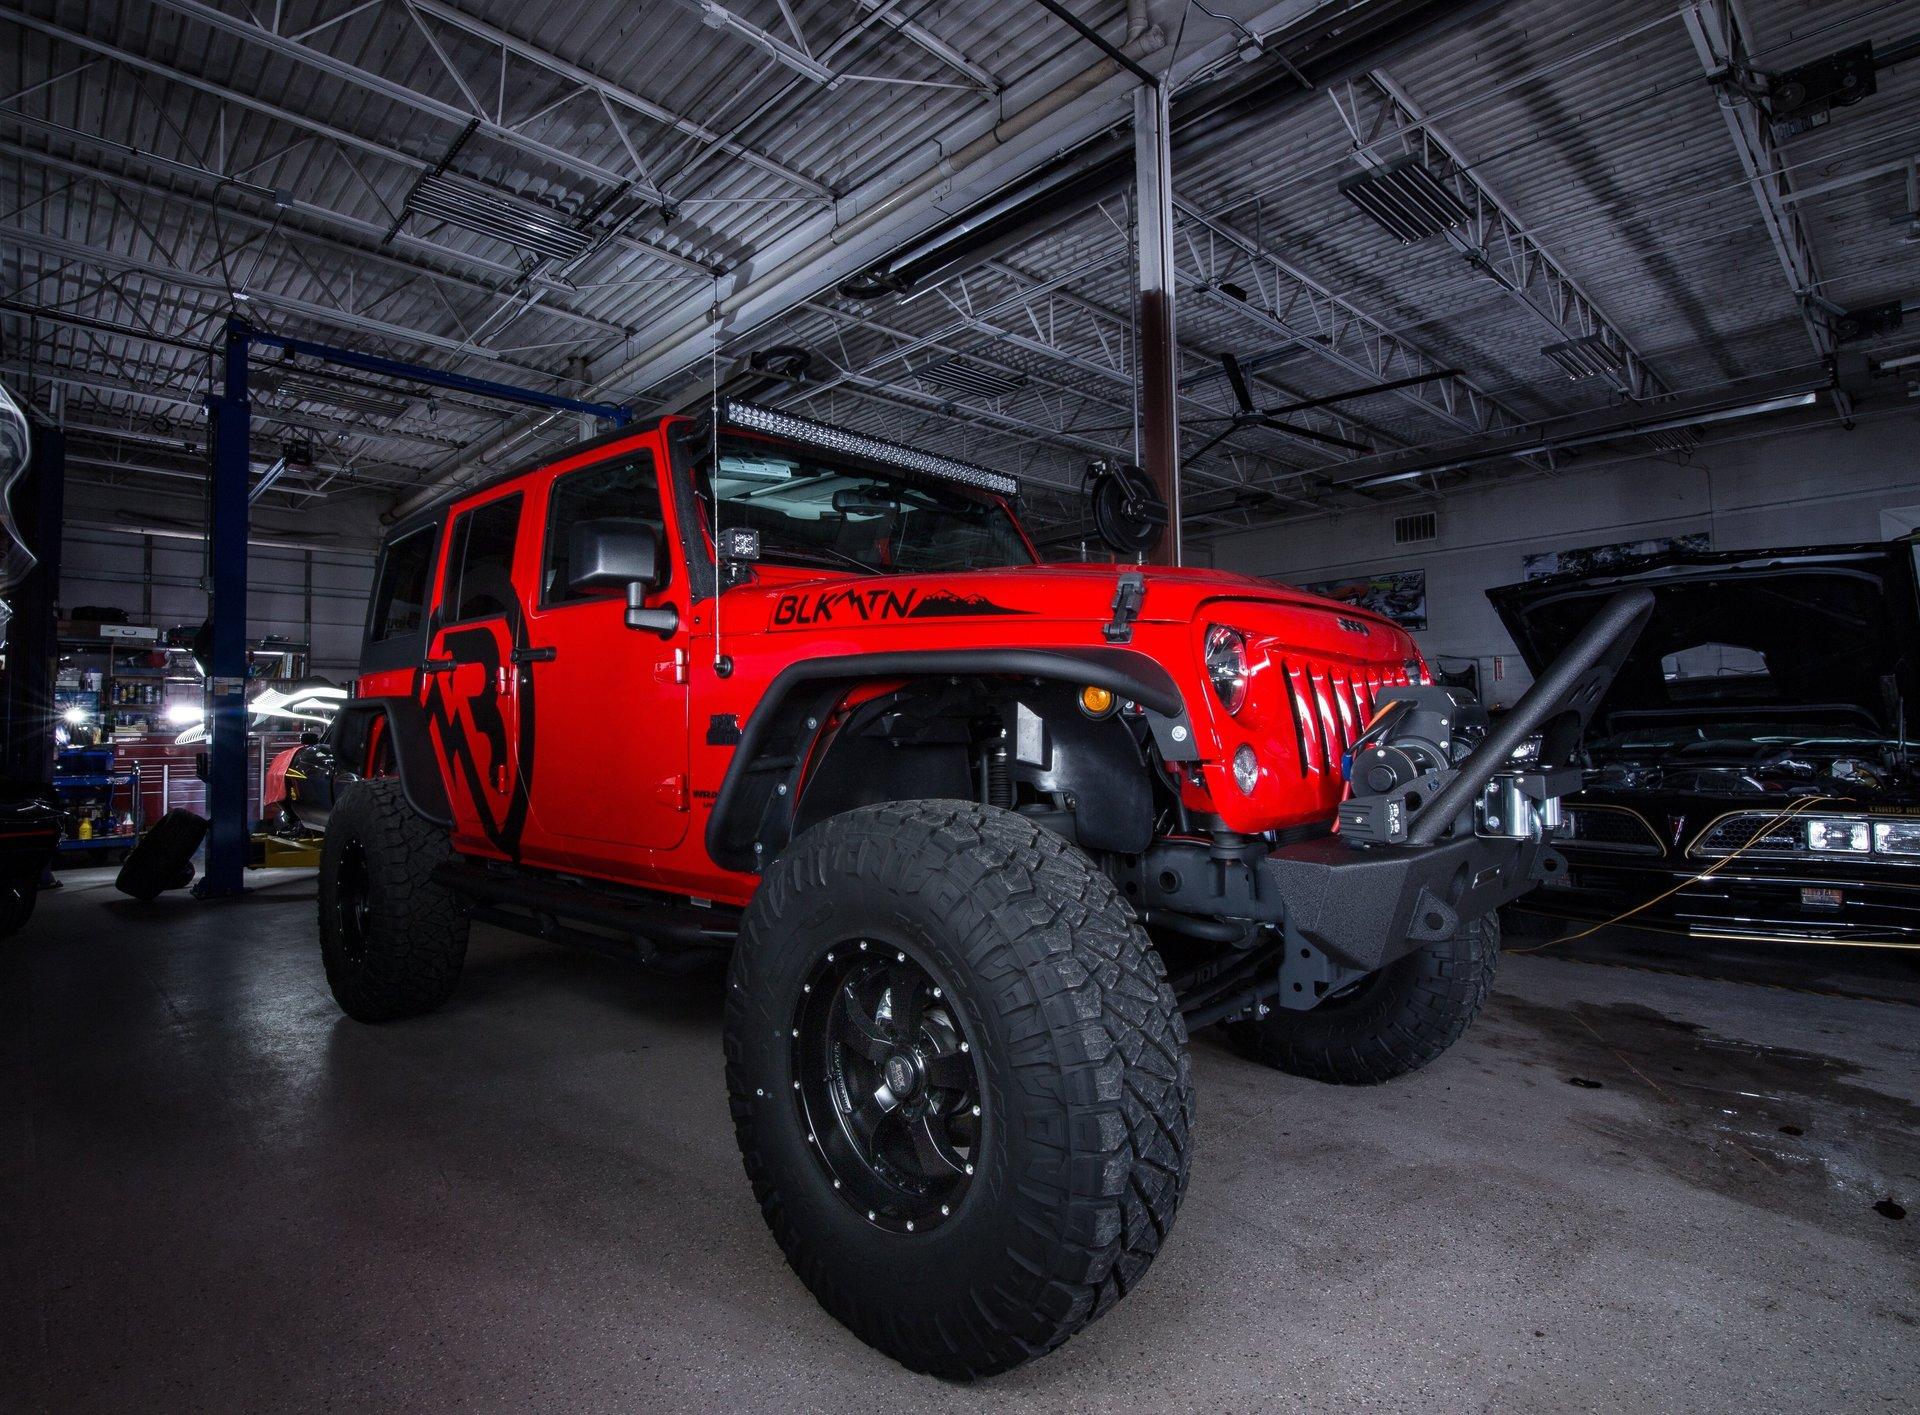 182818841d2c3 hd 2017 jeep wrangler